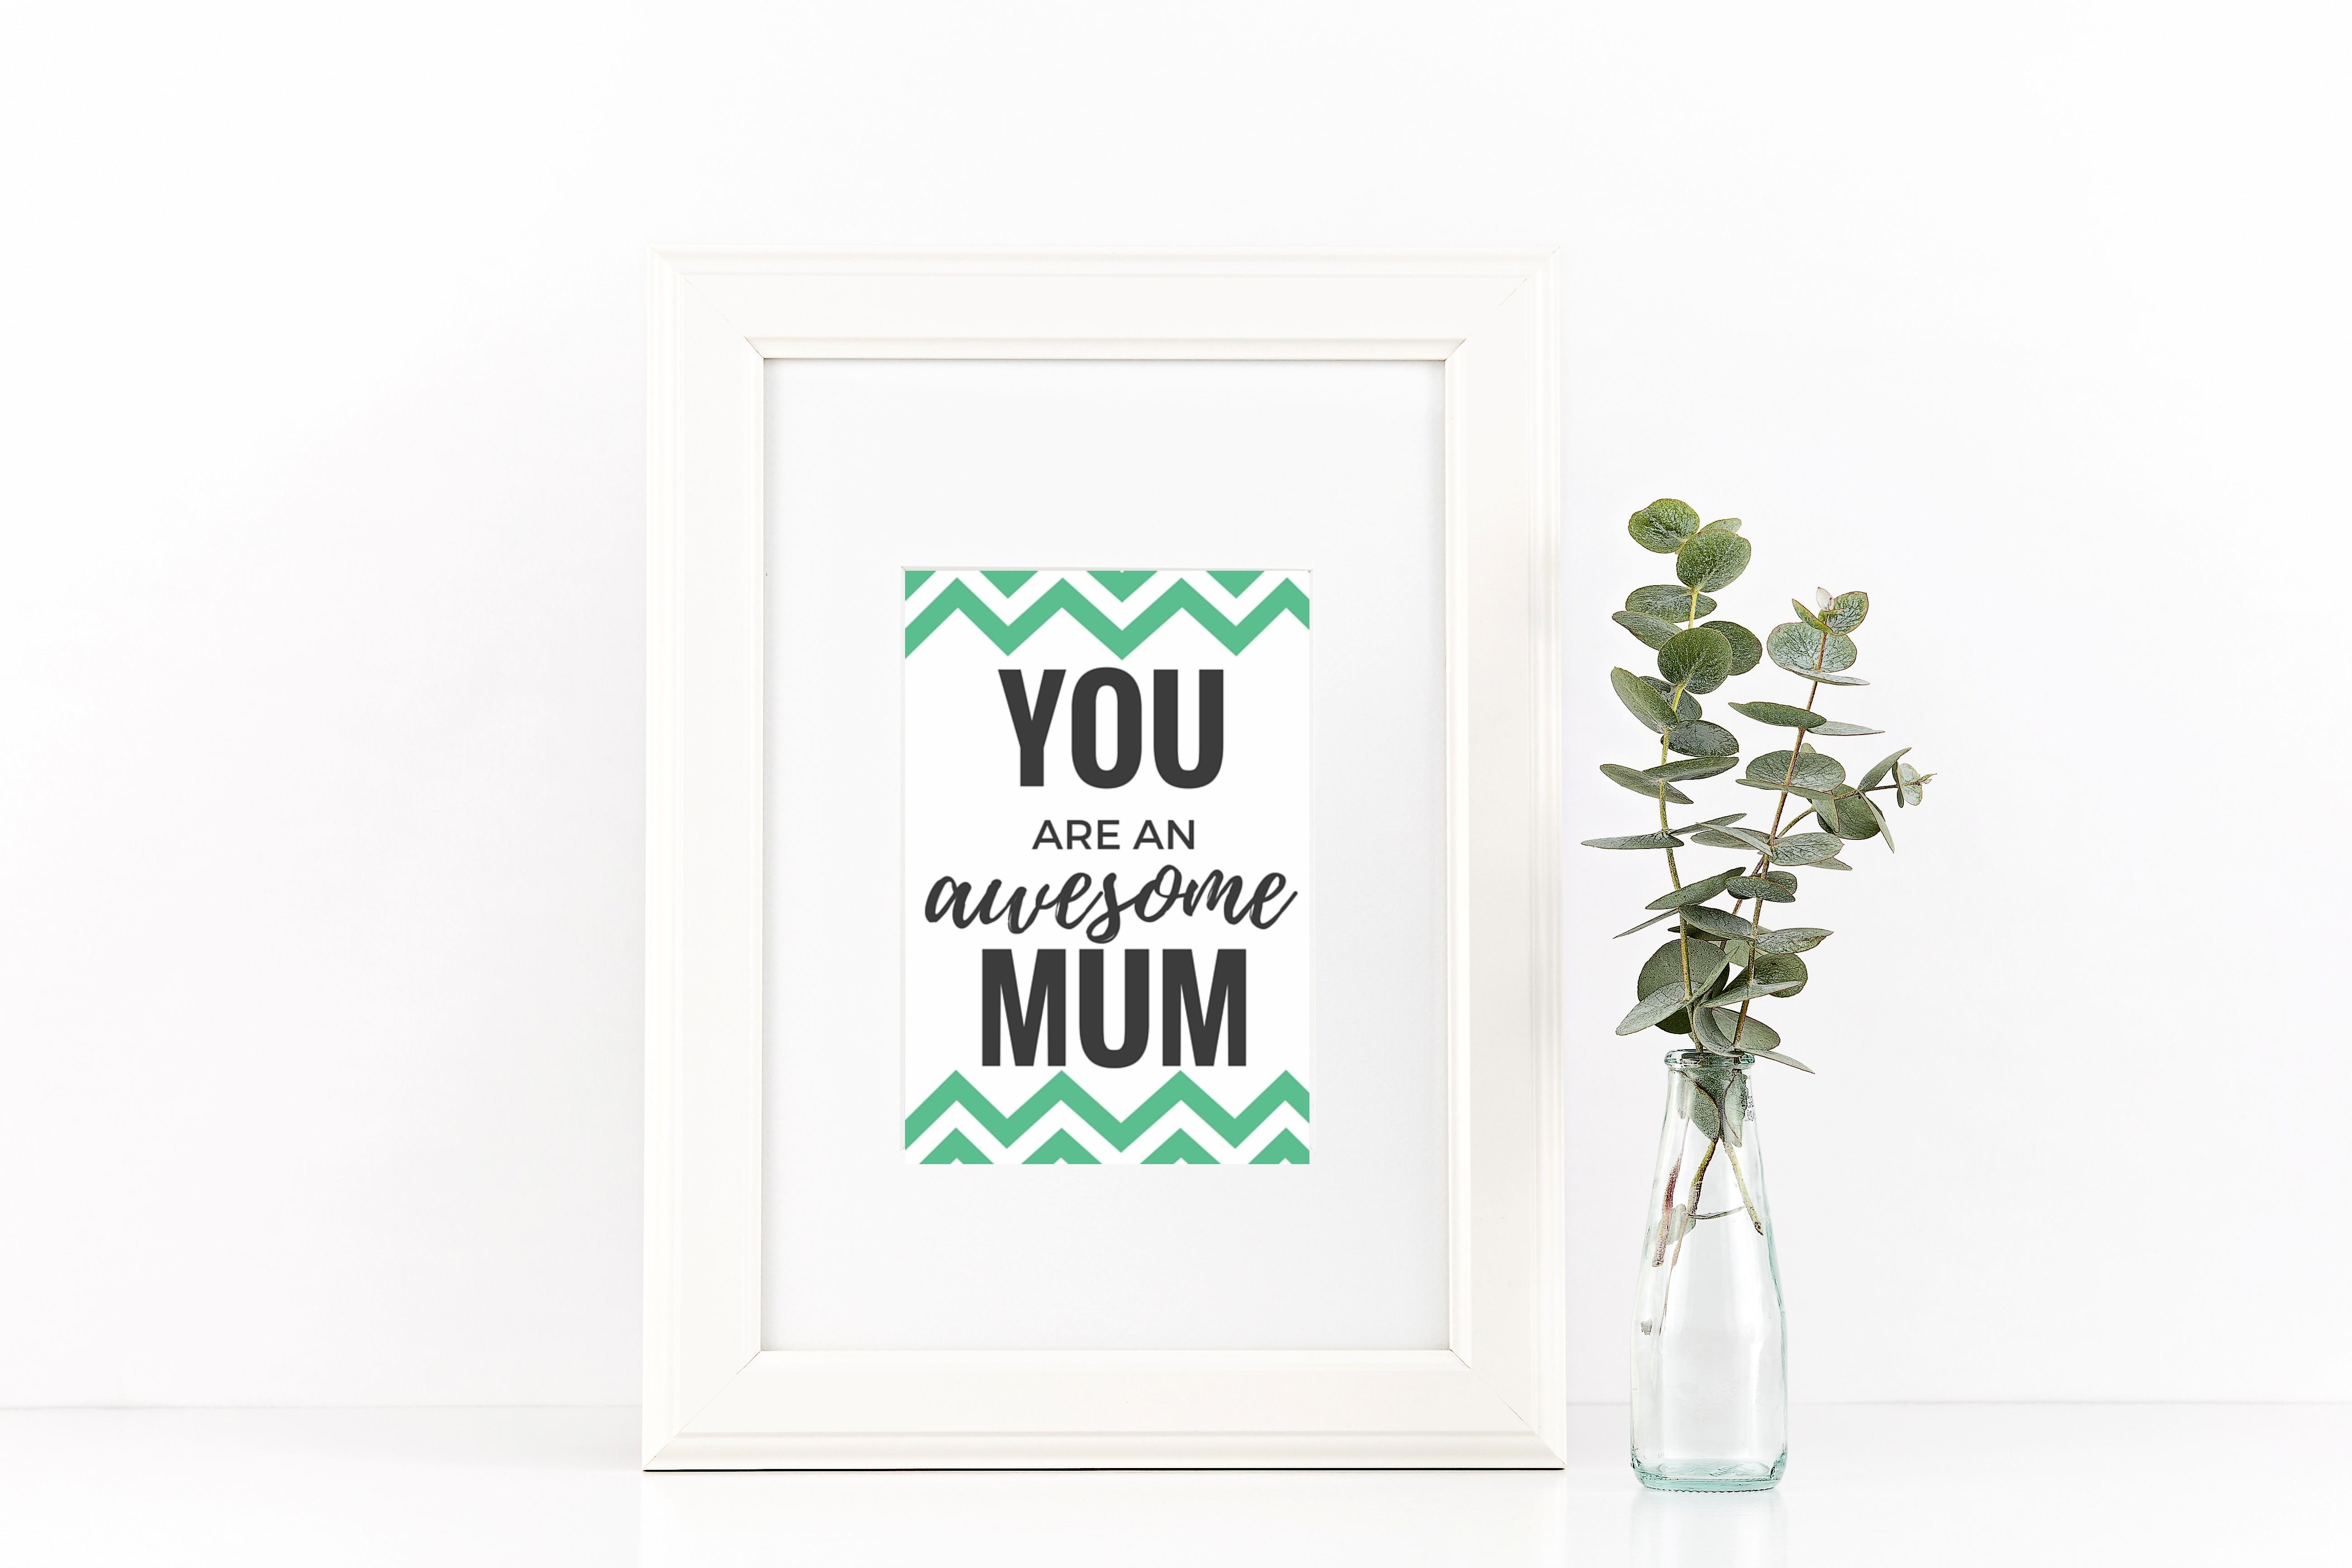 JLMD_Frame_mockup_Mothers Day